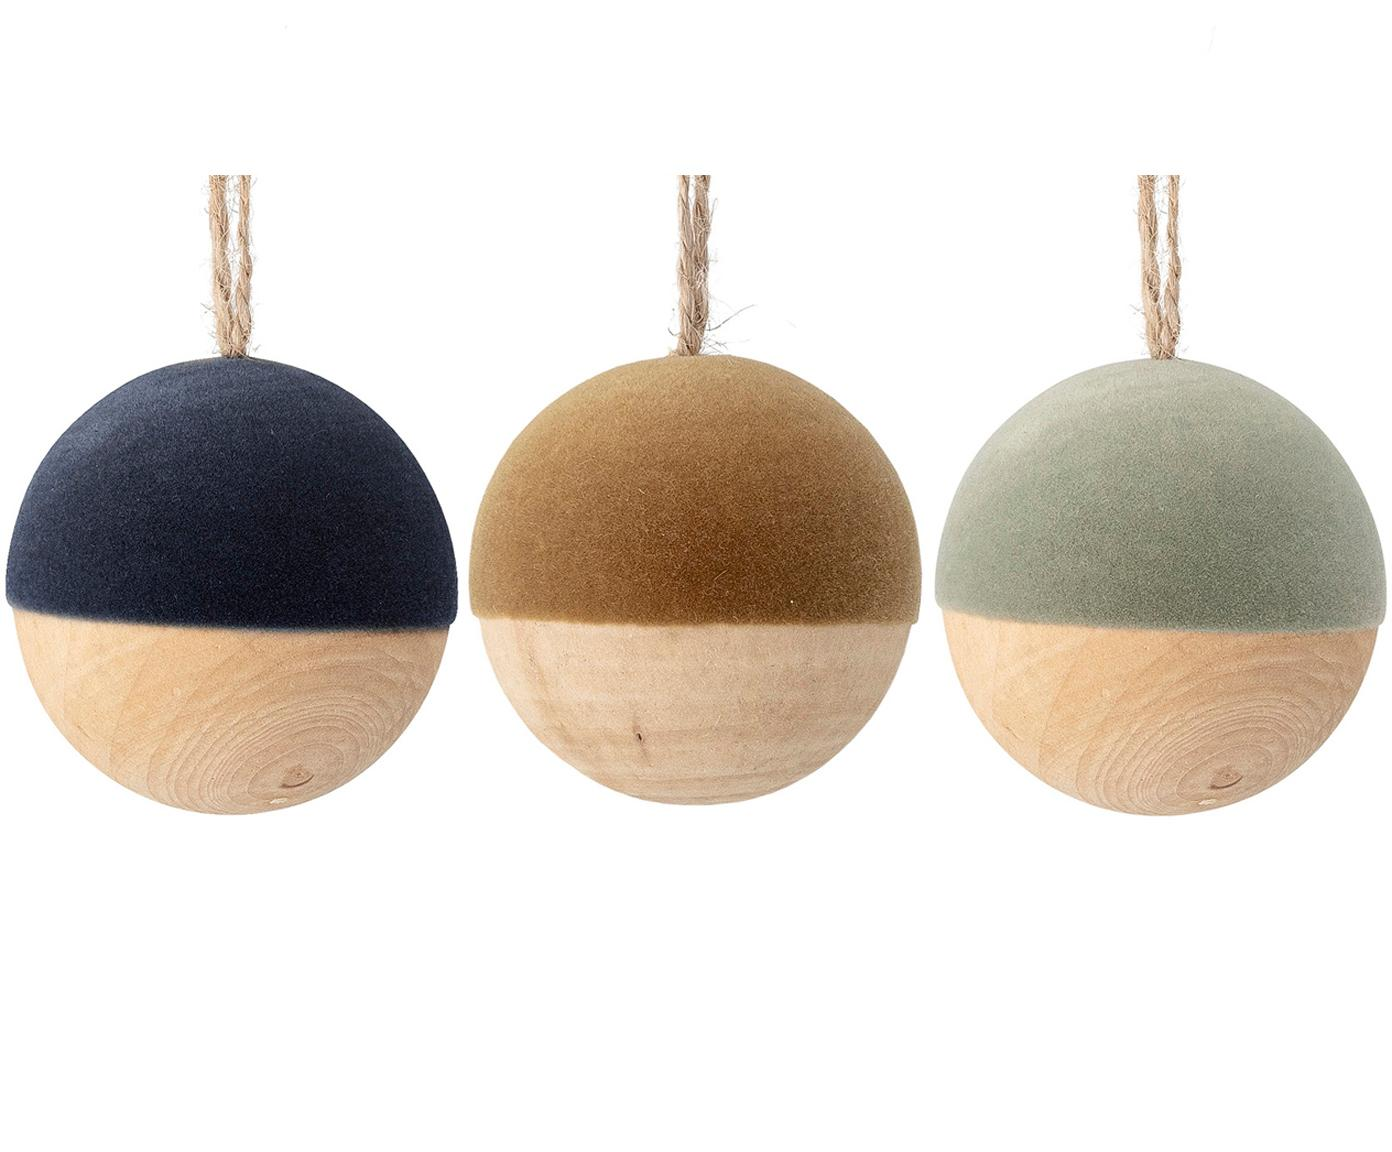 Samt-Weihnachtskugel-Set Thace, 3-tlg., Holz, Polyestersamt, Dunkelblau, Senfgelb, Mintgrün, Holz, Ø 5 cm